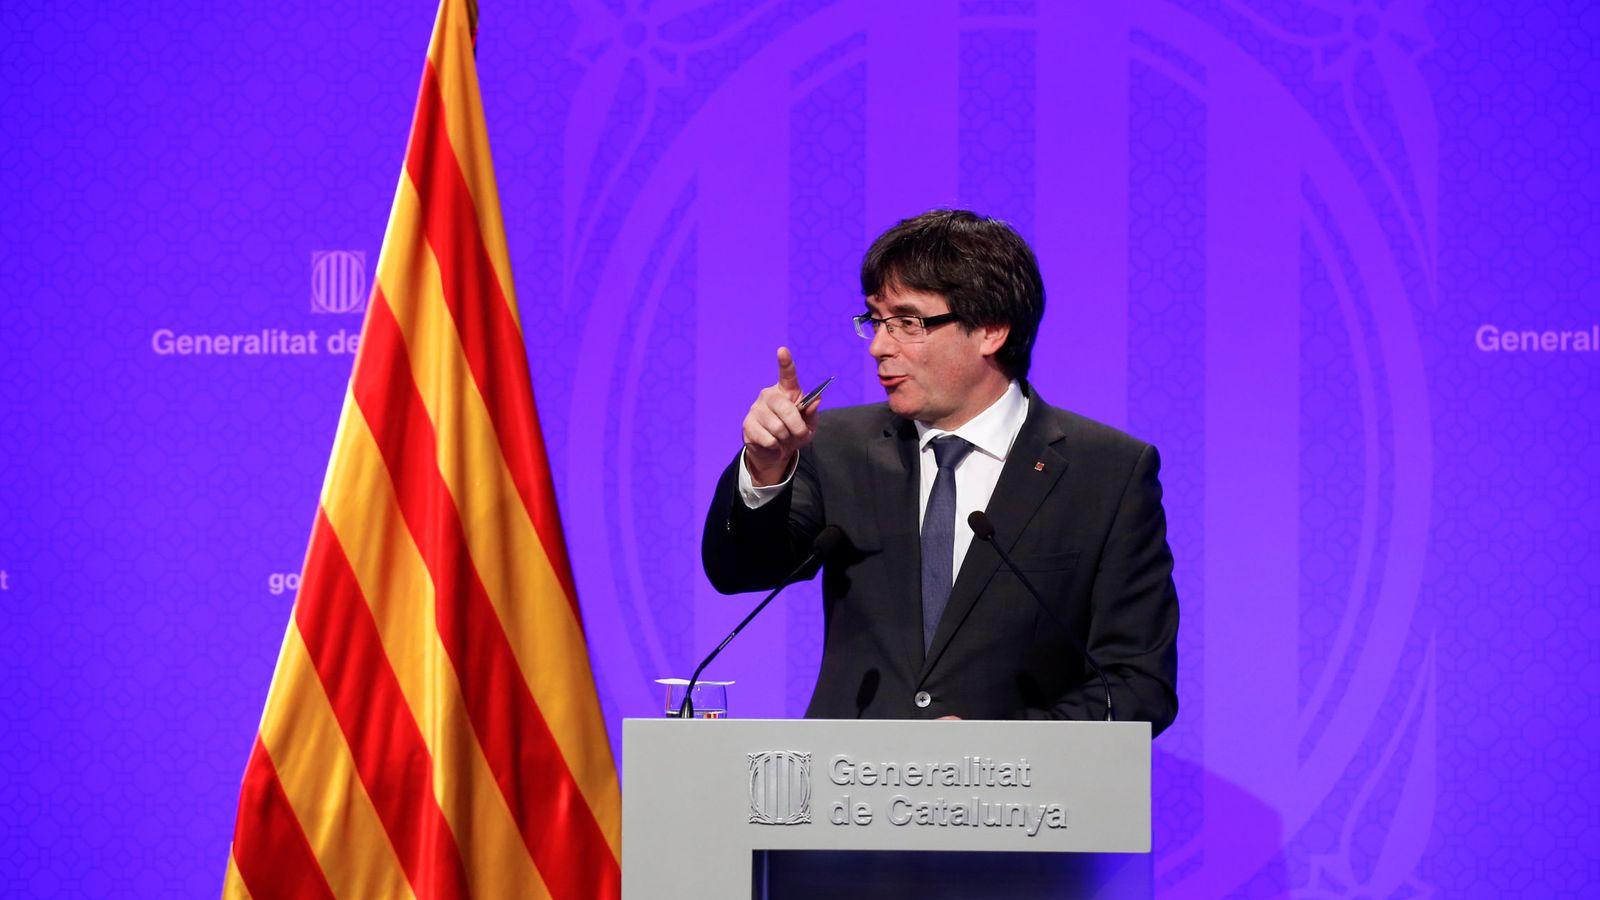 Foto: El presidente de la Generalitat, Carles Puigdemont. (Reuters)